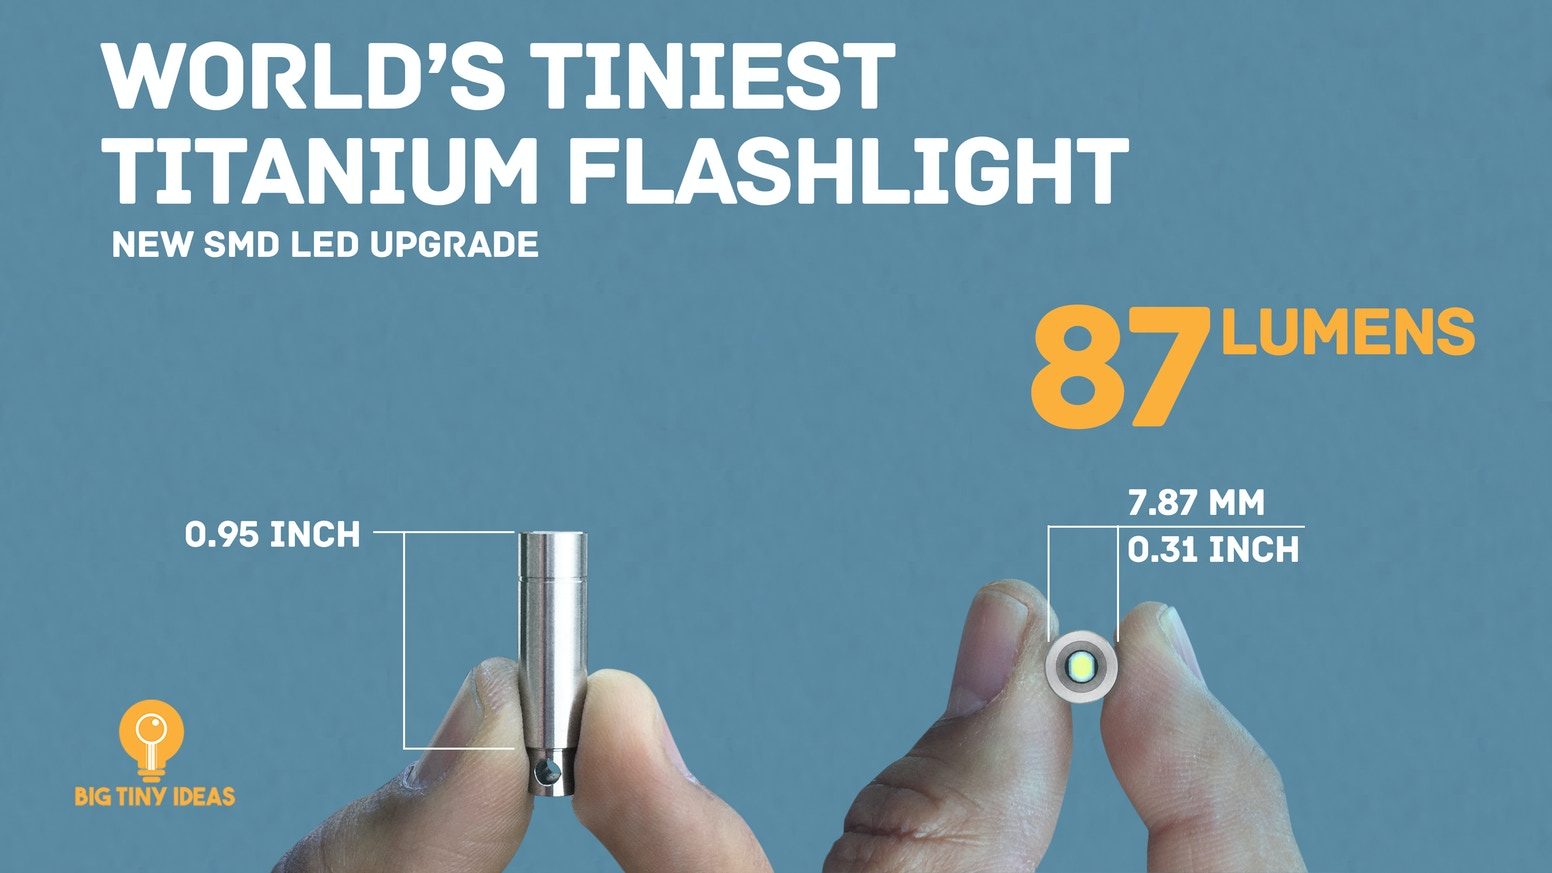 World's tiniest,  titanium body, extremely durable, waterproof, perfect EDC flashlight.